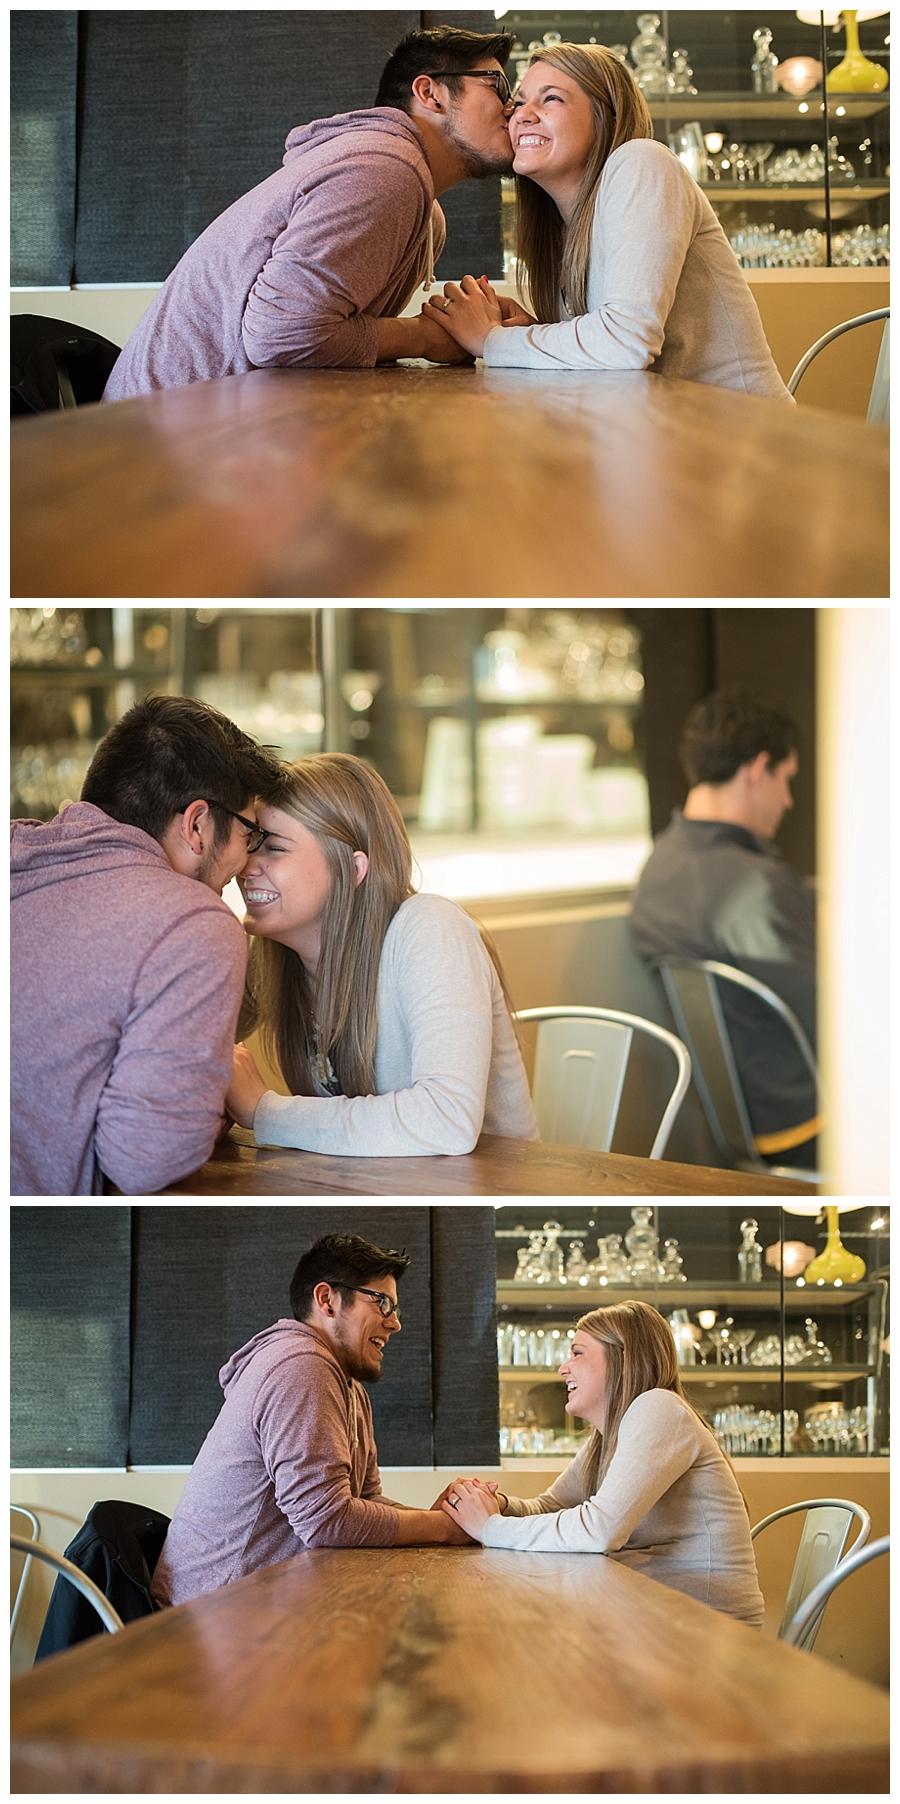 OKC-coffee-shop-engagement-couple-photos